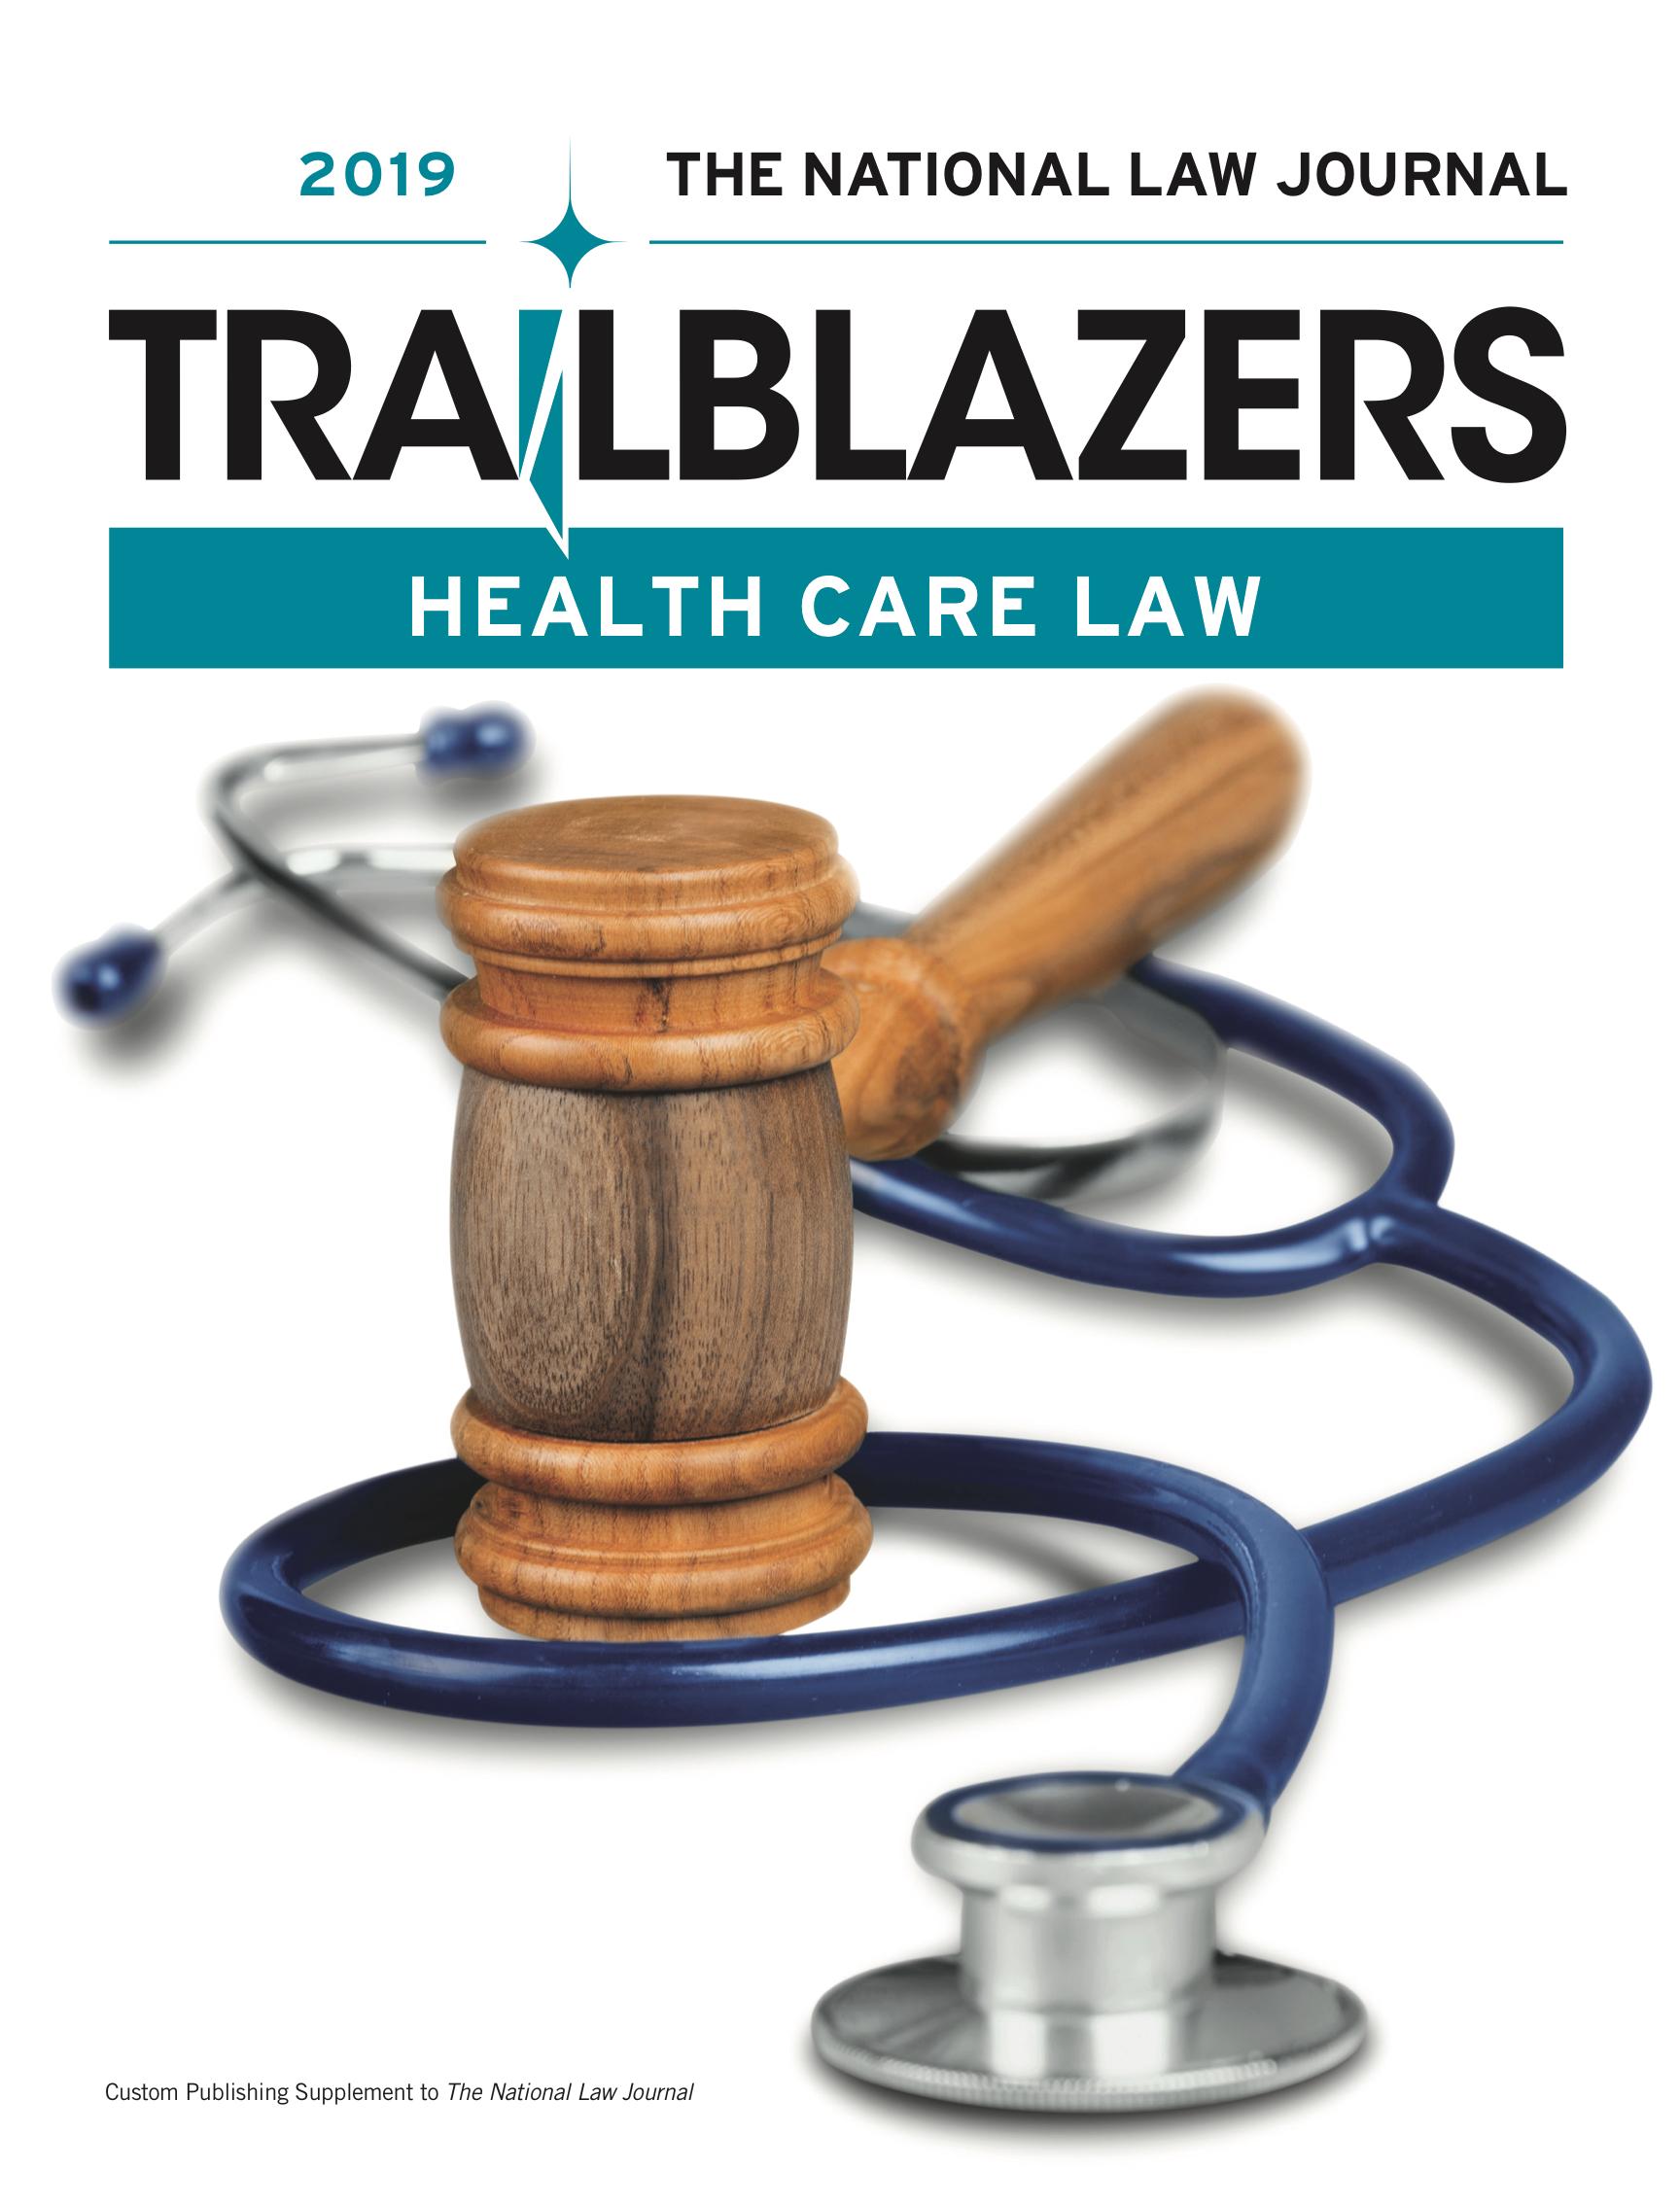 health care law news